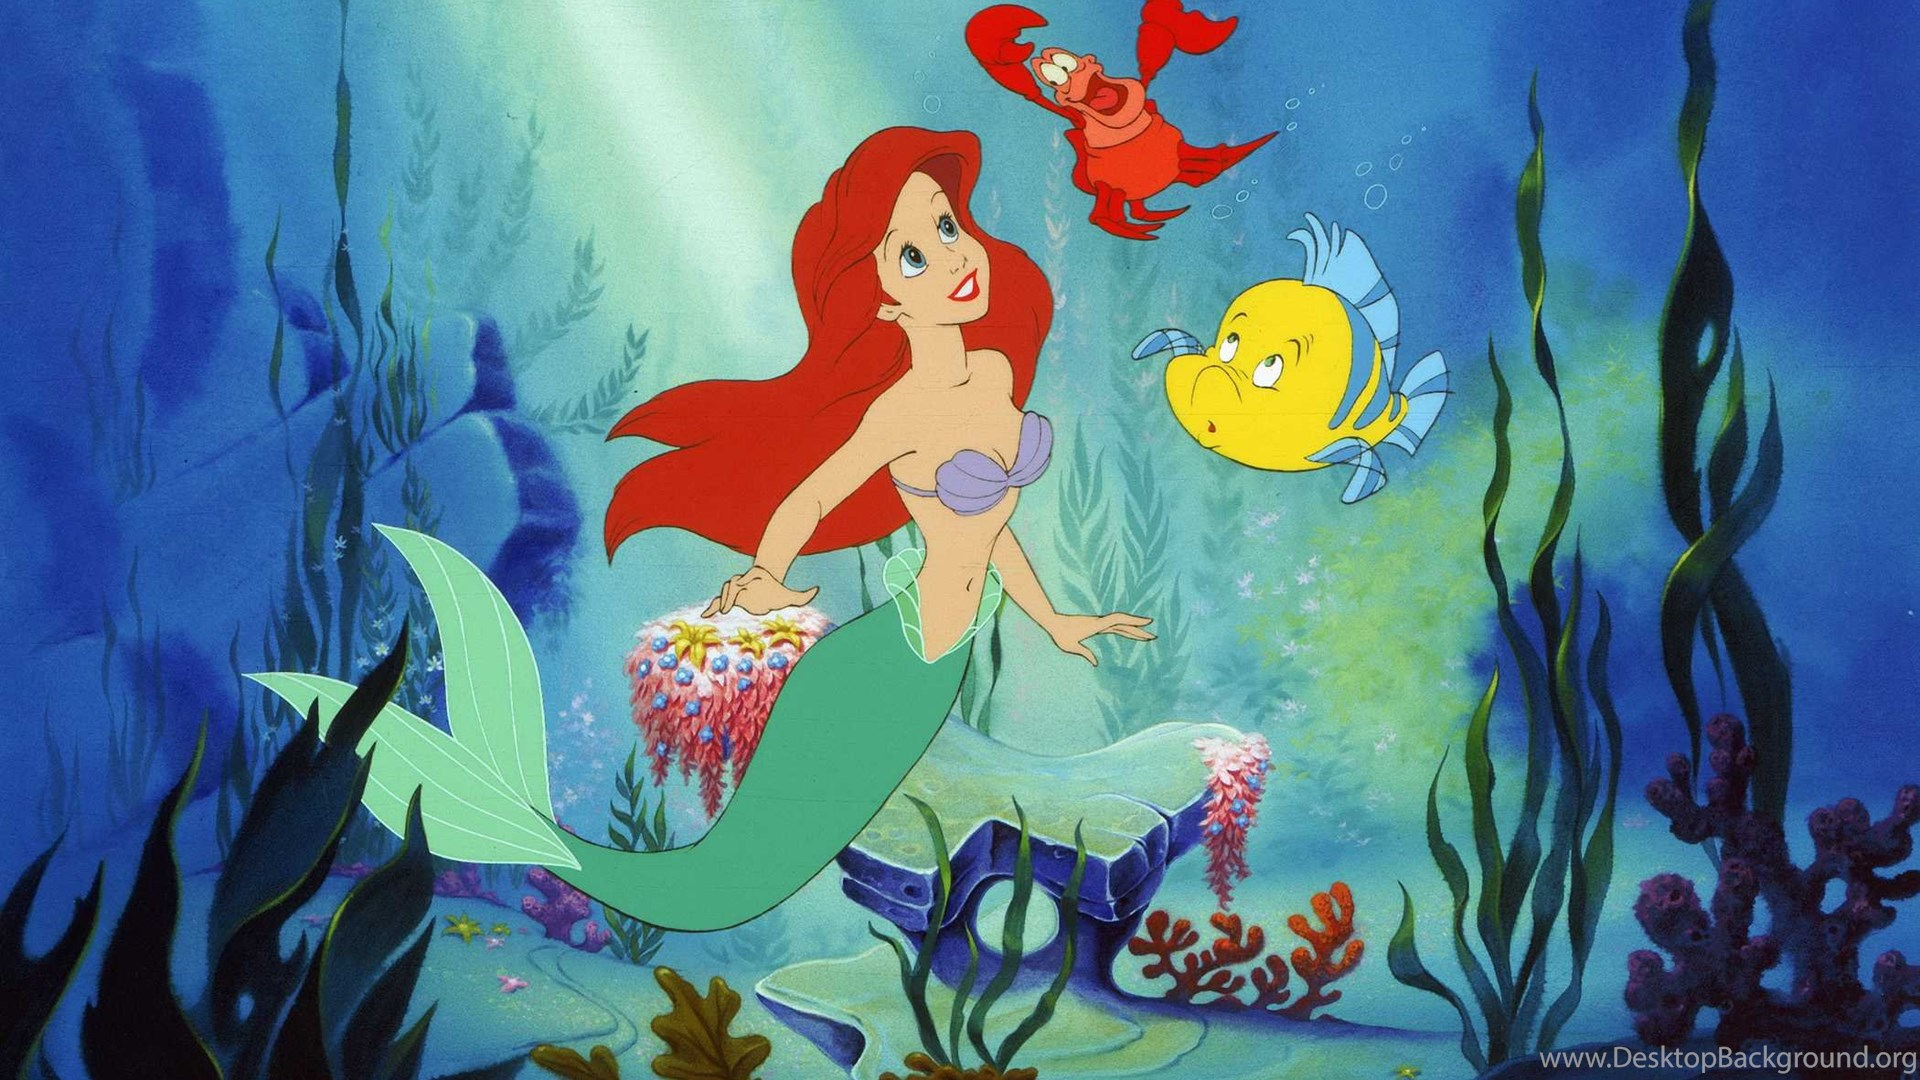 Little Mermaid Wallpapers Hd 9574 Hd Wallpapers Site Desktop Background